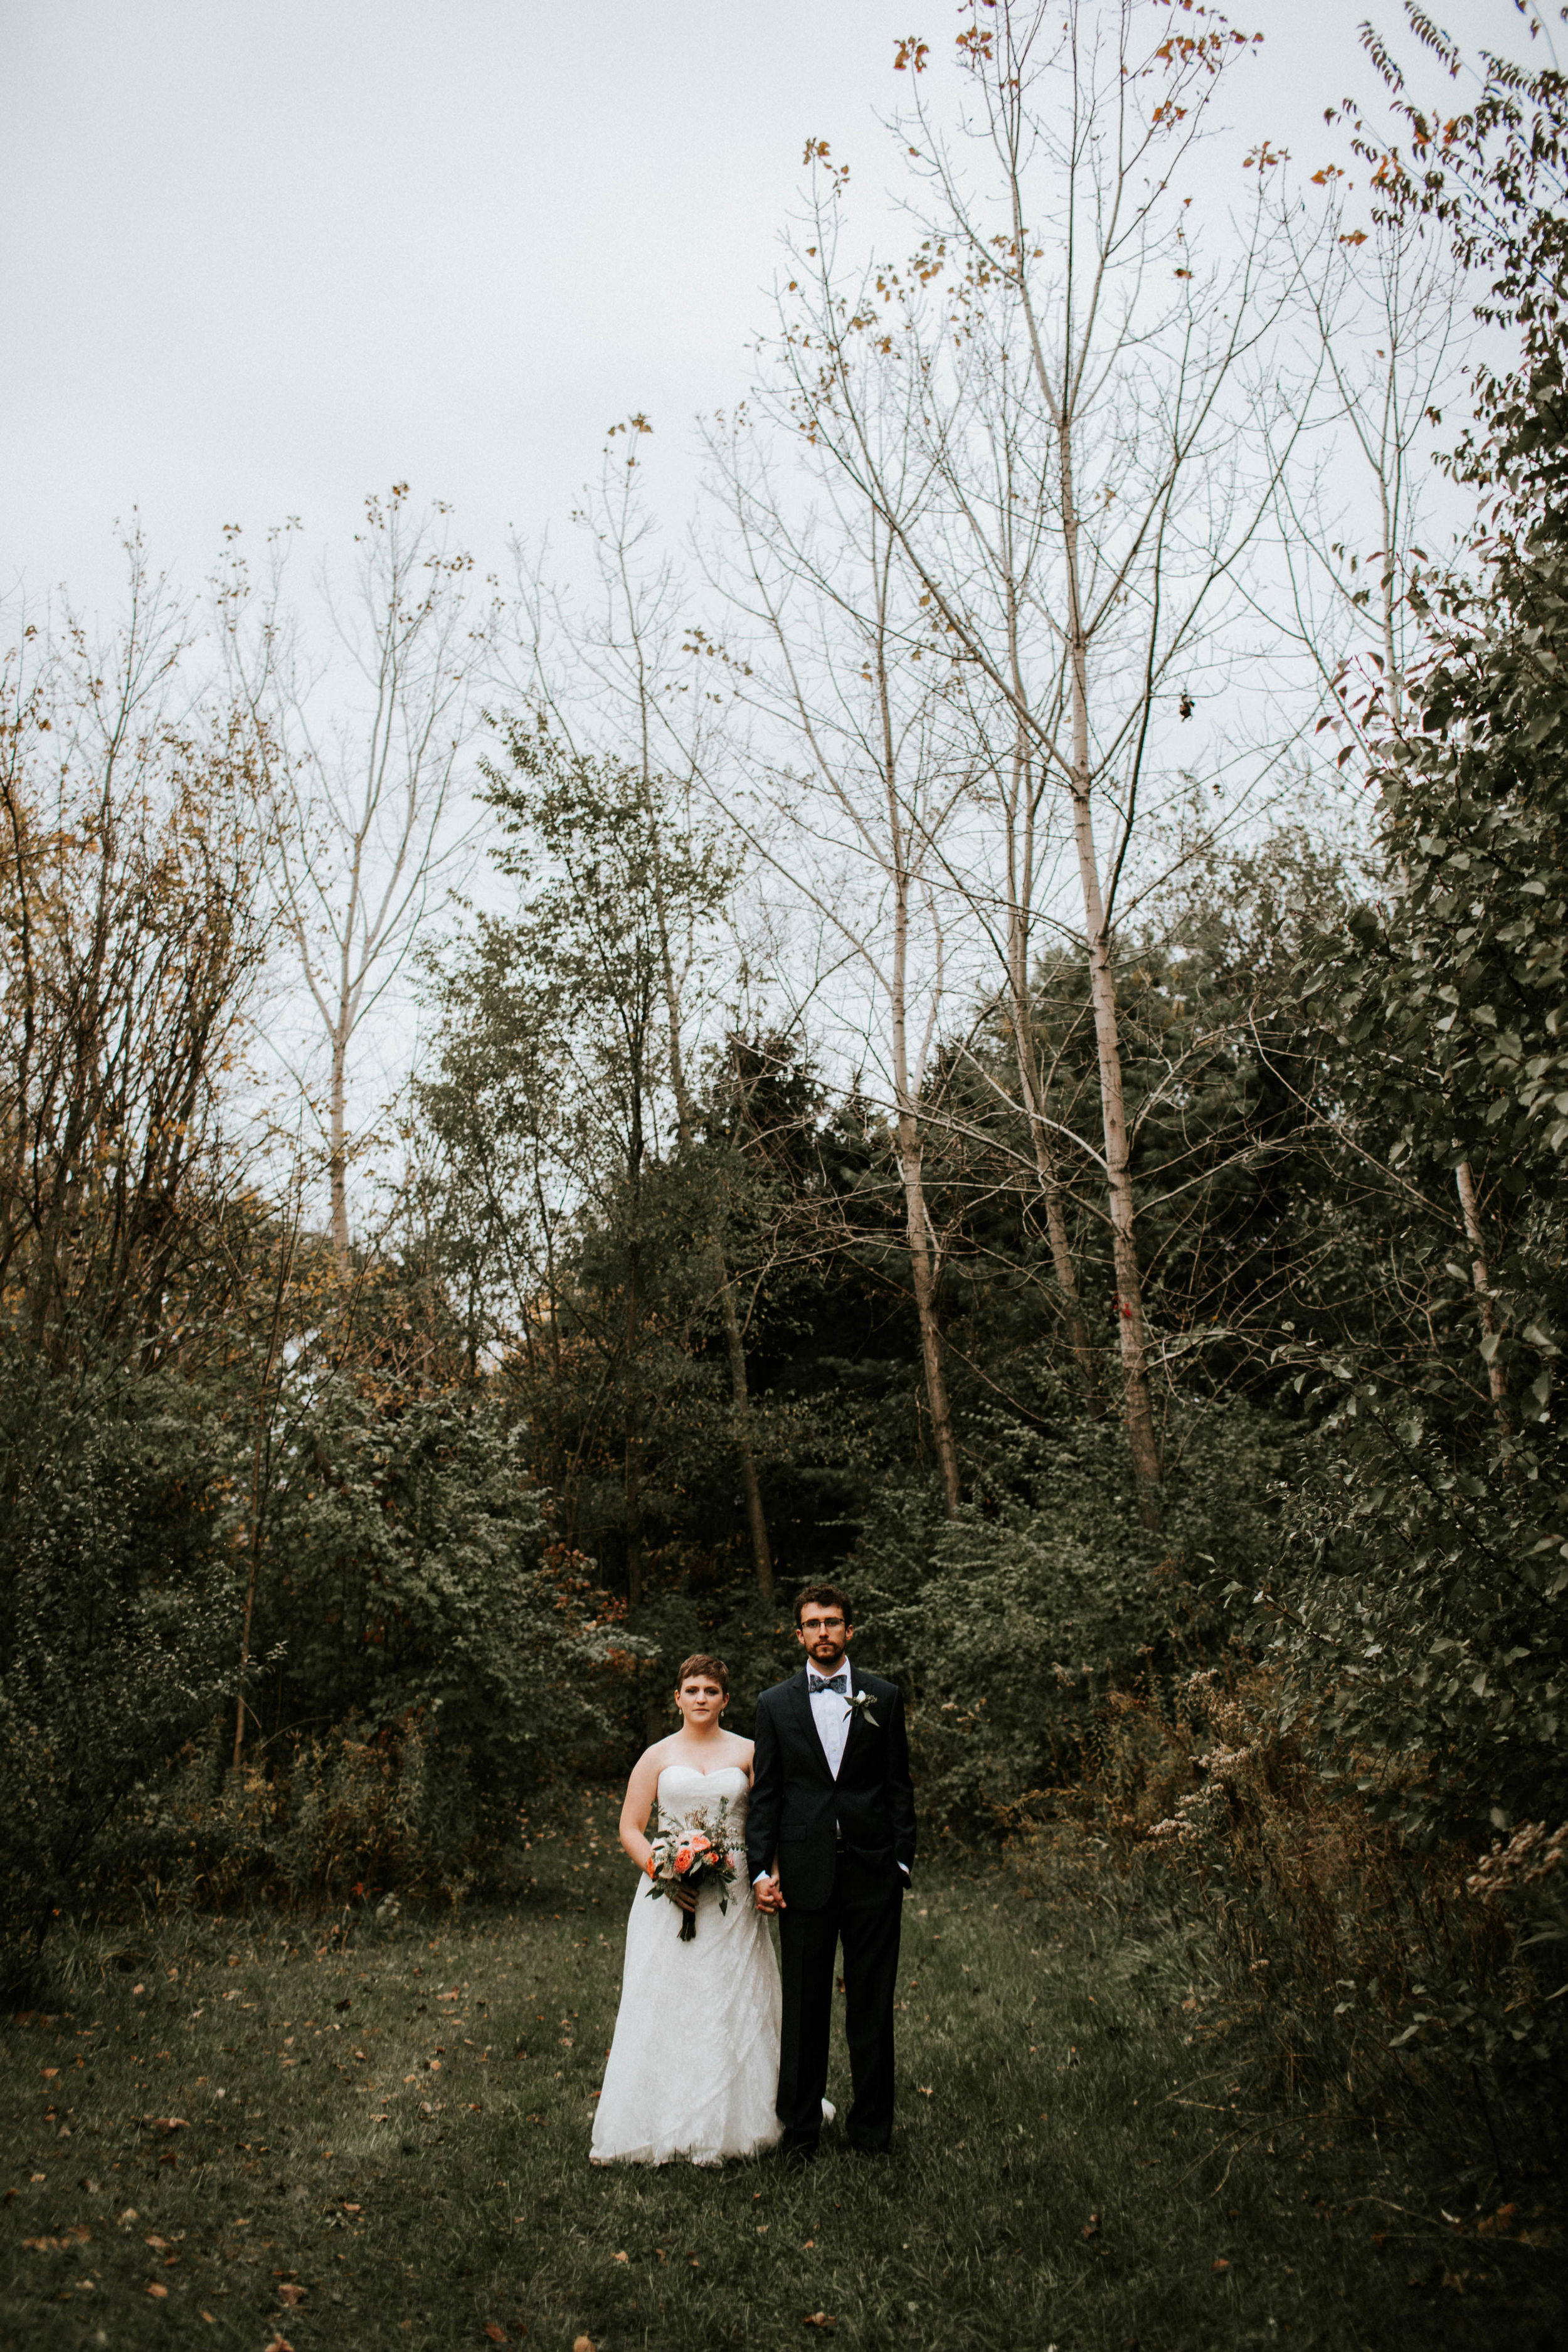 Columbus ohio wedding photographer grace e jones photography real fun joyful wedding52.jpg